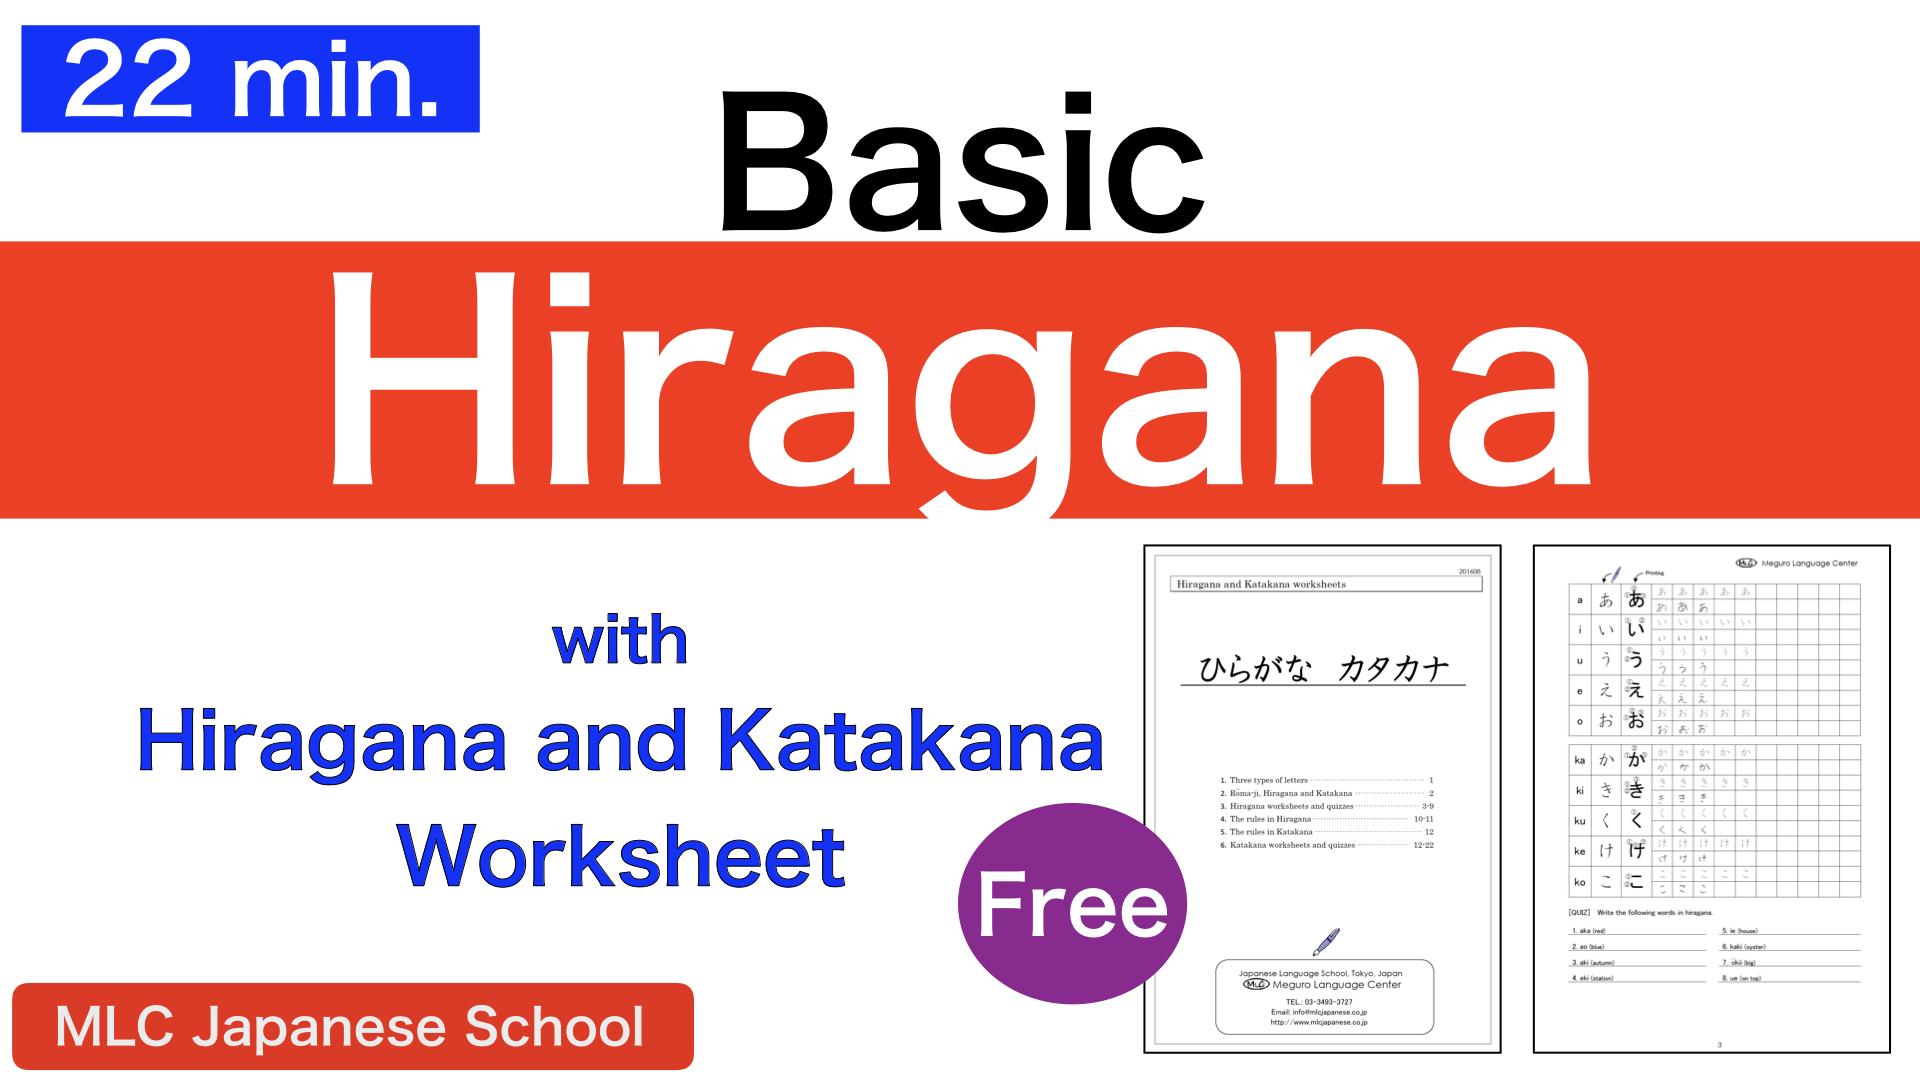 Basic Hiragana In 22 Min With Free Worksheet